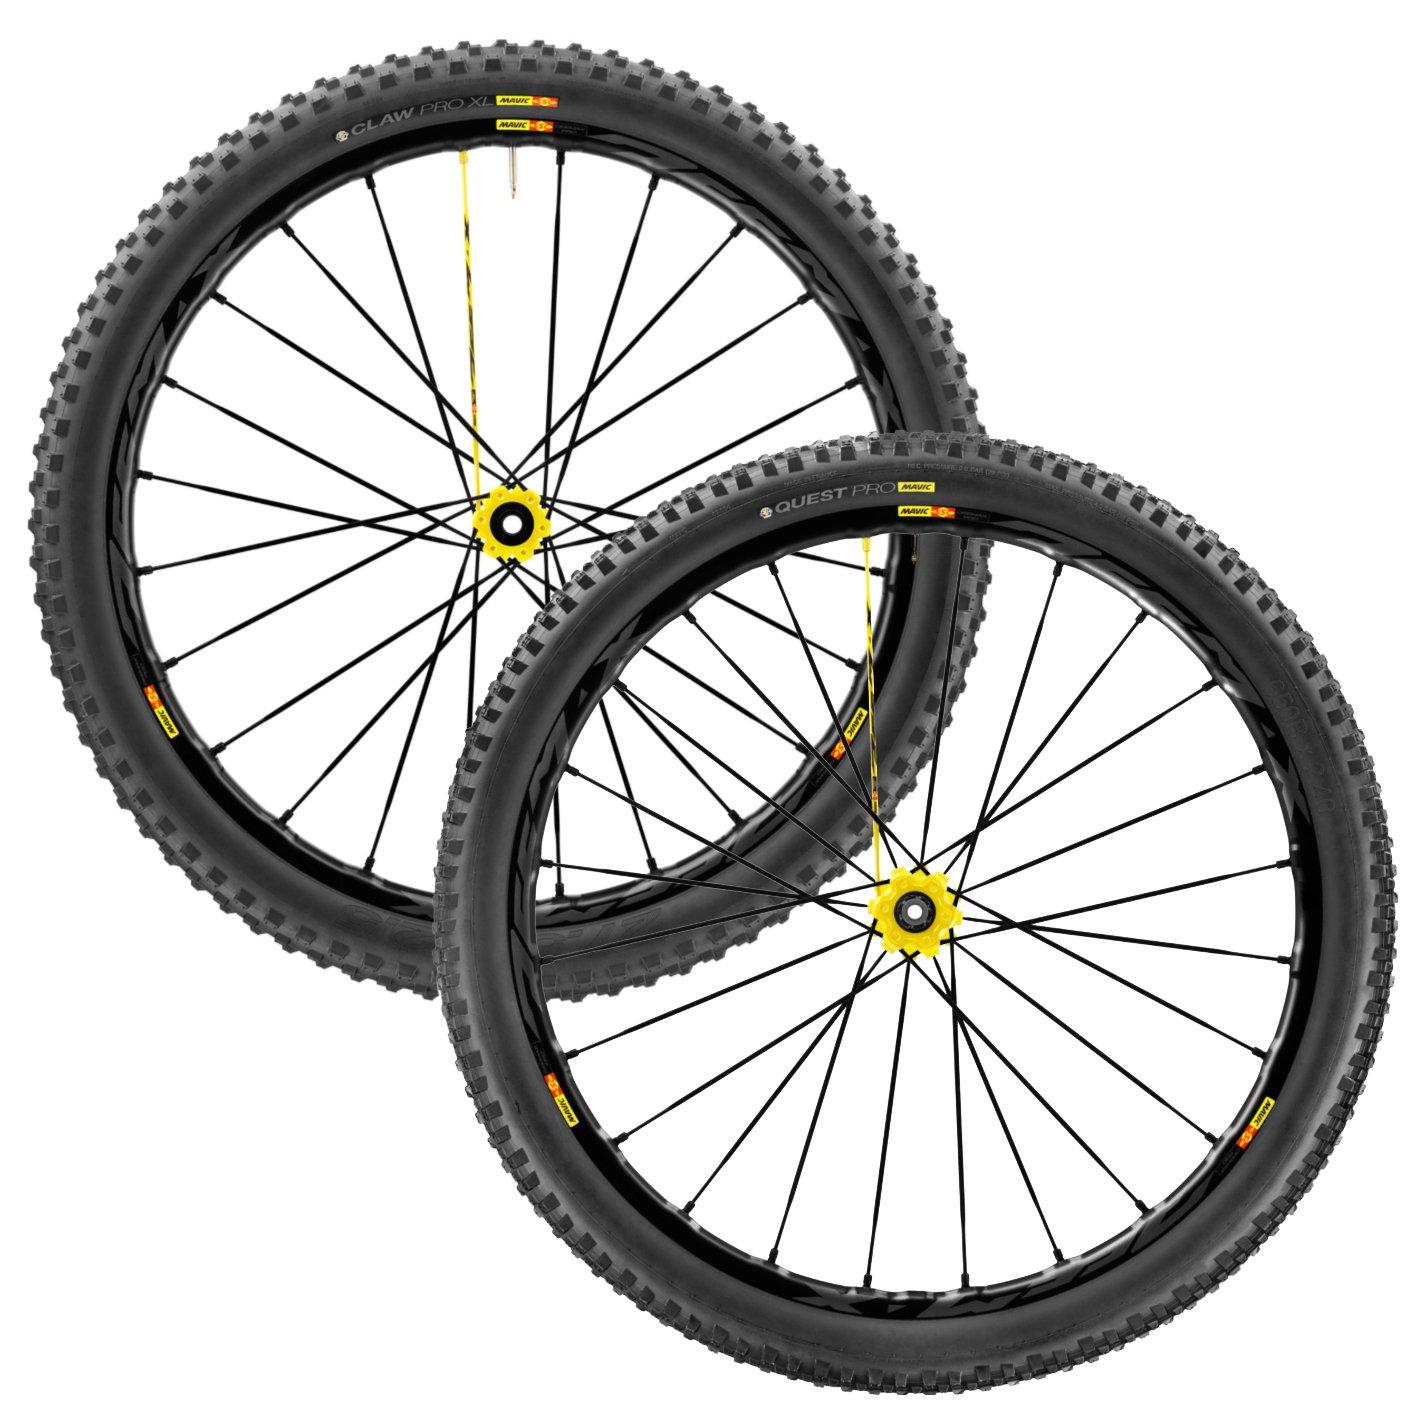 MAVIC(マビック) DEEMAX PRO 27.5 MTB Wheelset 2017 - Front: 27.5x2.50/Rear: 27.5x2.40 [Shimano/Sram] [並行輸入品] B074388772